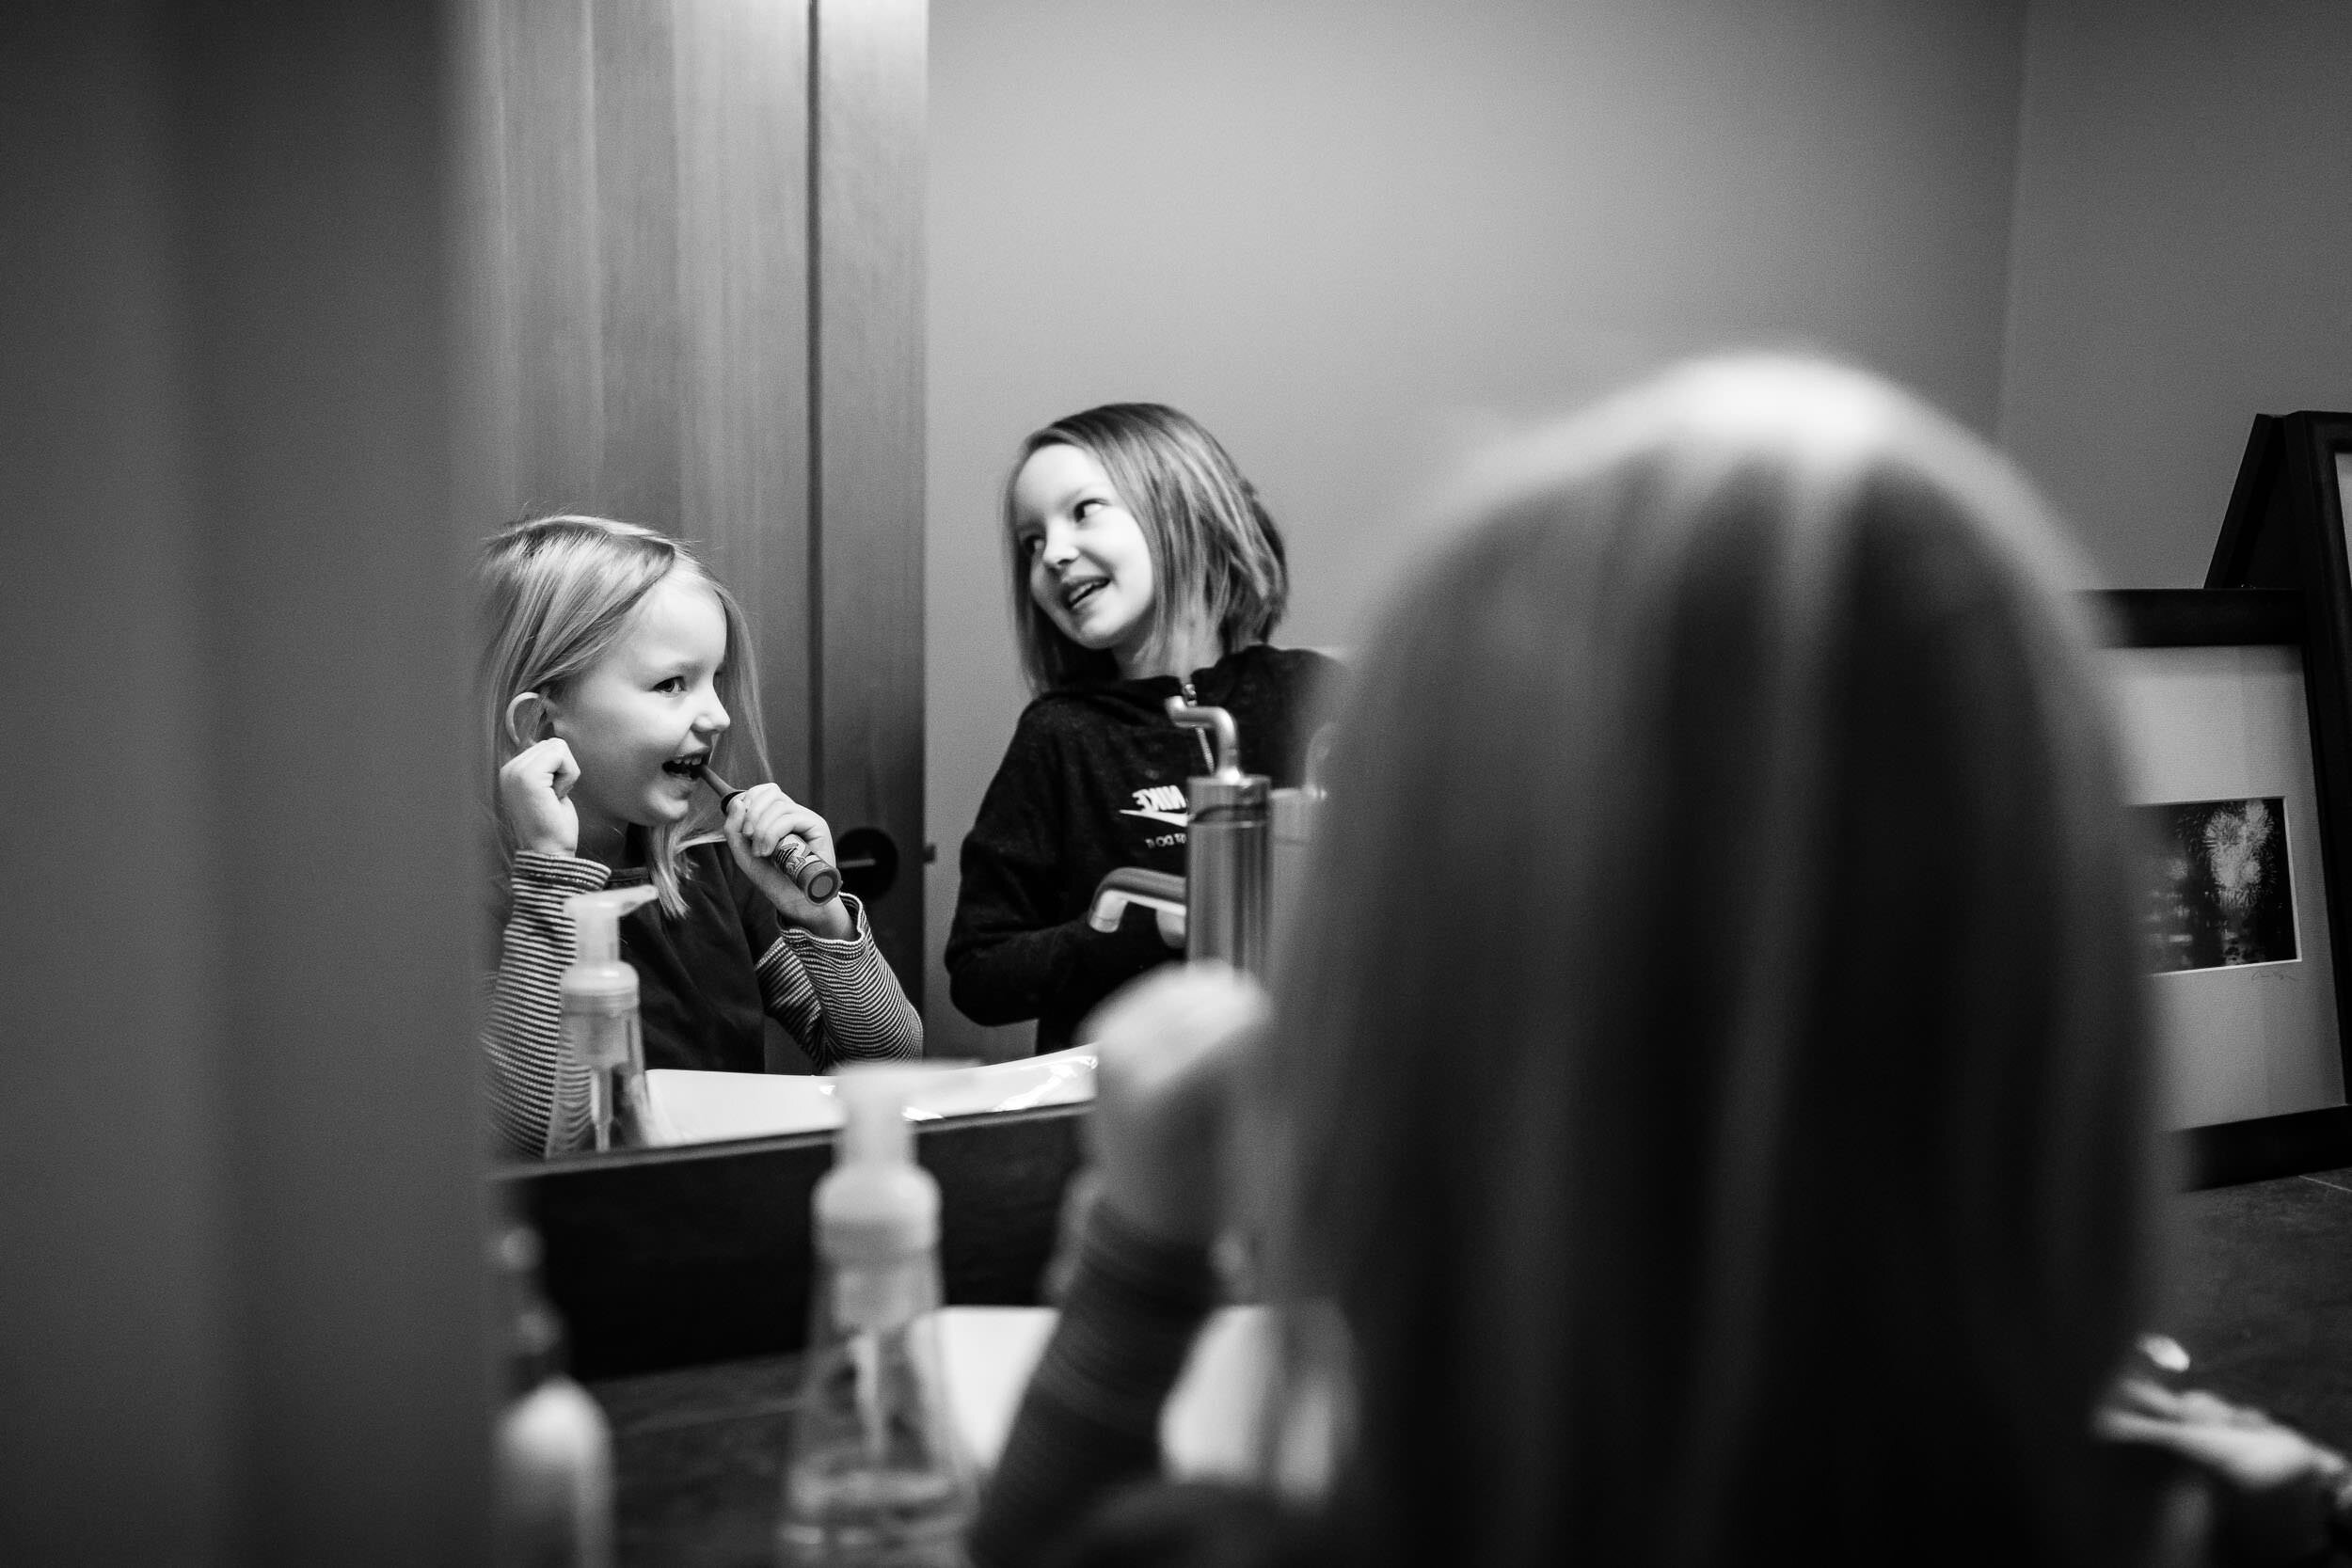 siblings-brushing-teeth-In-Home-photography-portland-oregon-rebecca-hunnicutt-farren-27.jpg